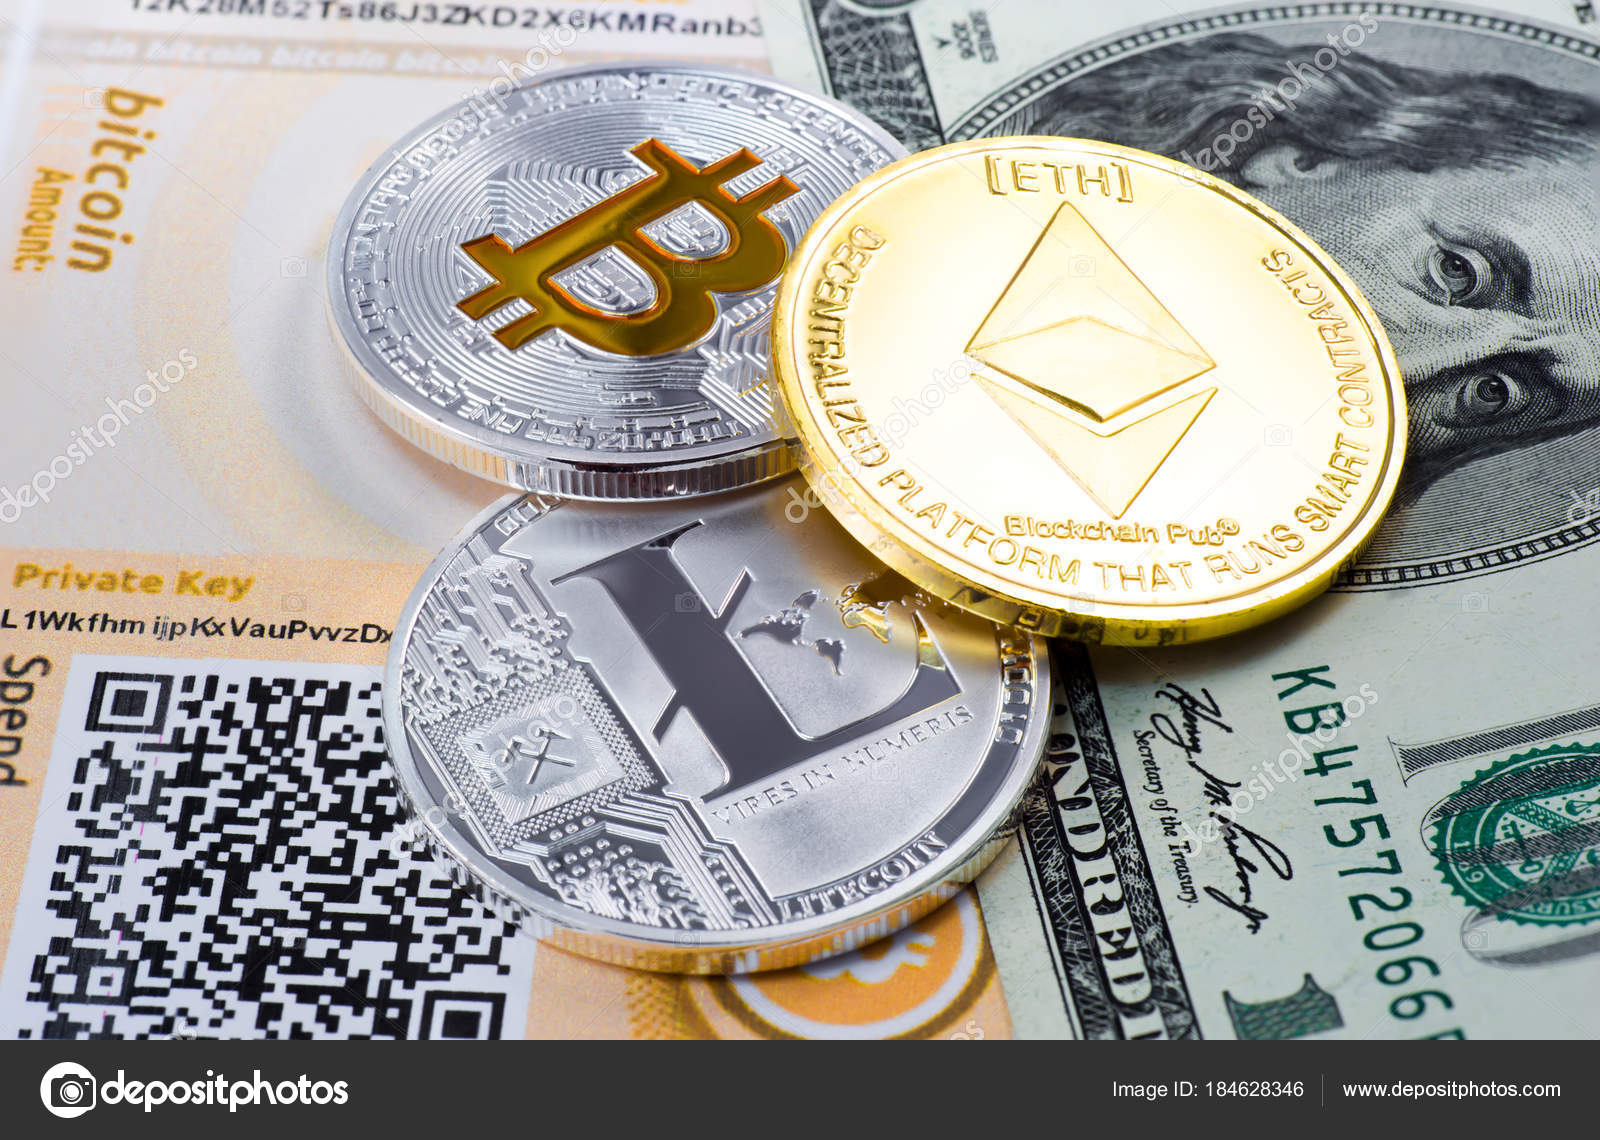 ethereum bitcoin and litecoin